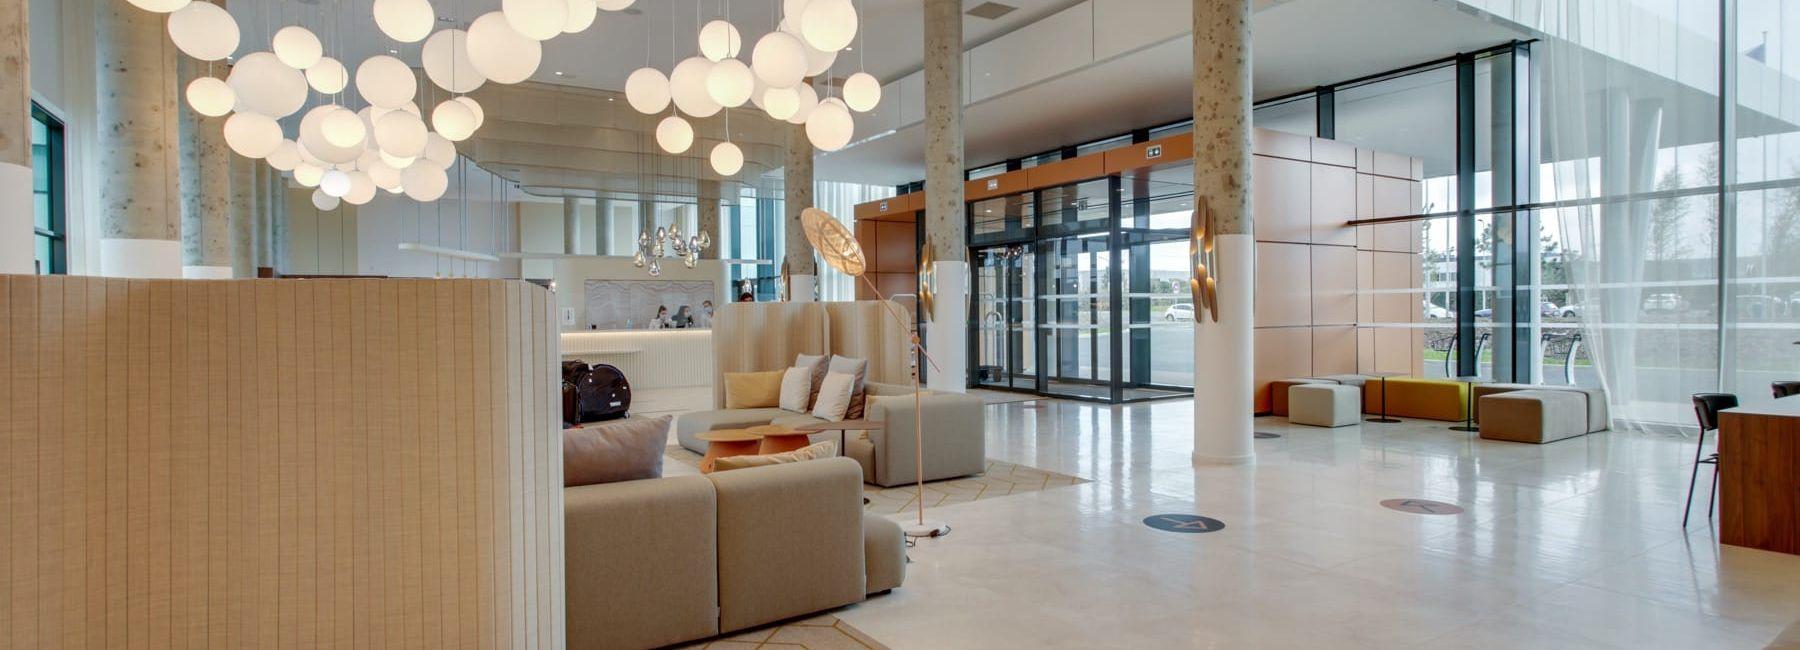 Hôtel HYATT • Roissy CDG